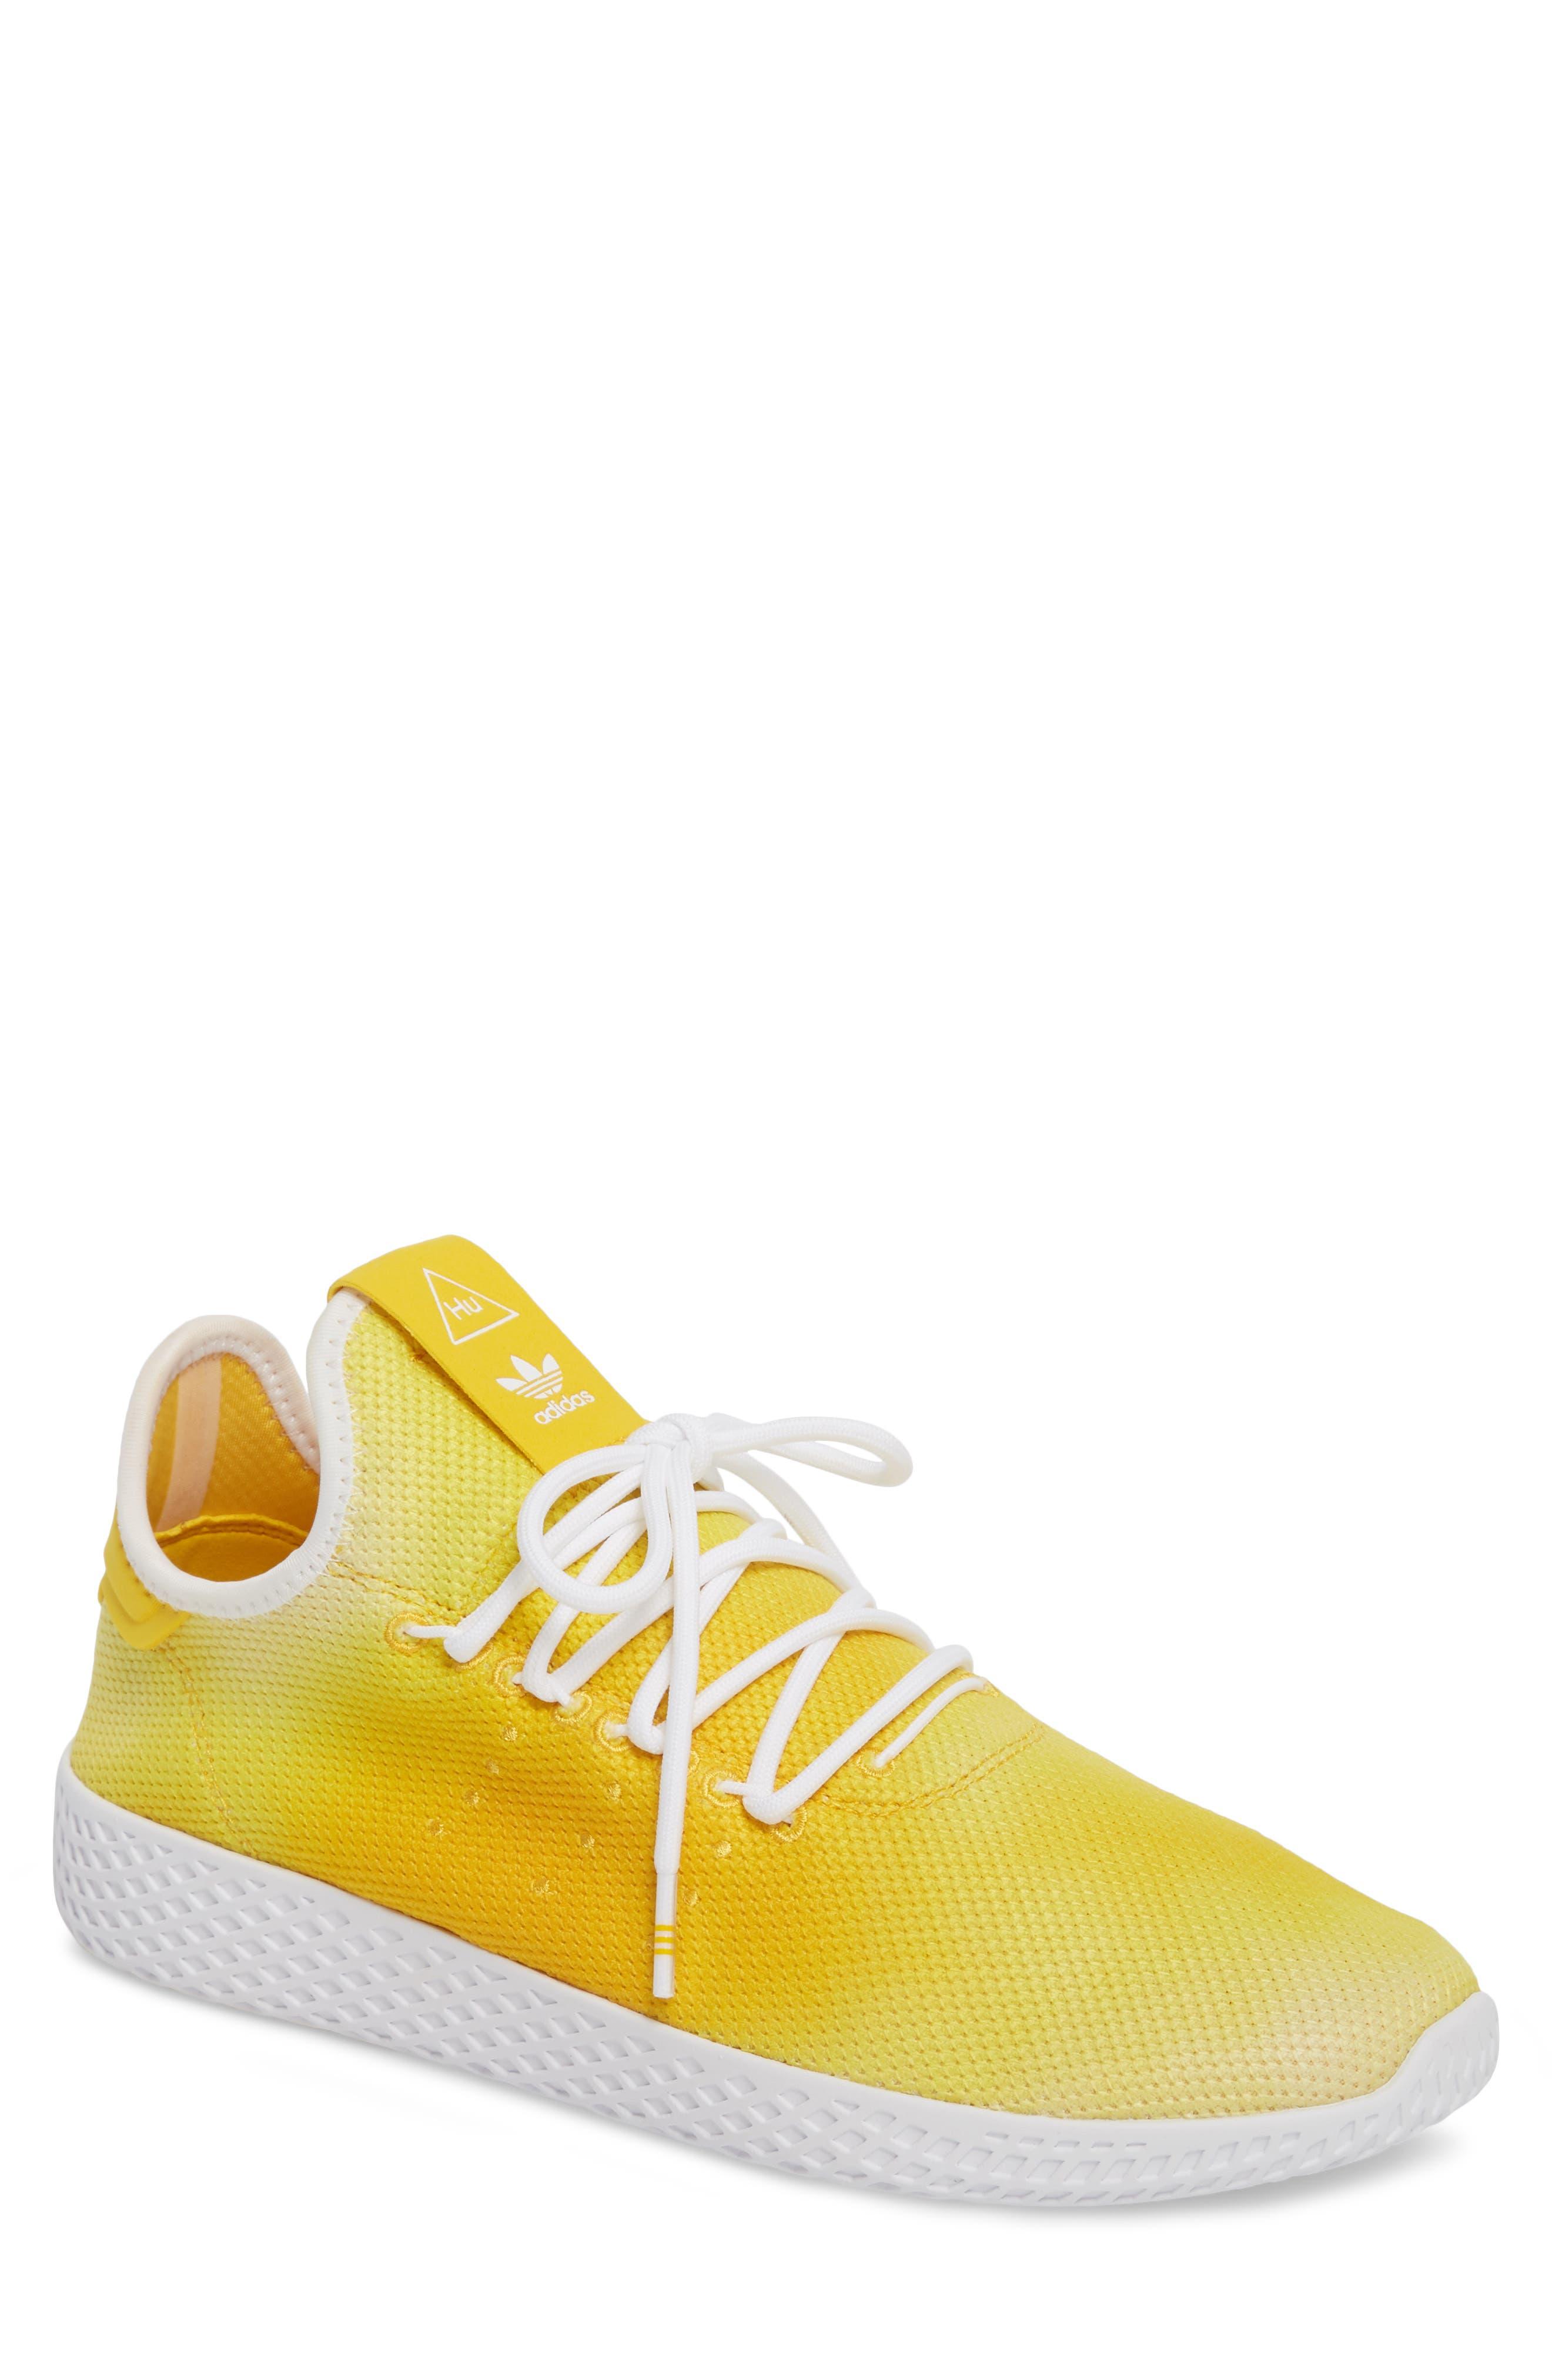 Pharrell Williams Tennis Hu Sneaker,                         Main,                         color, YELLOW/ WHITE